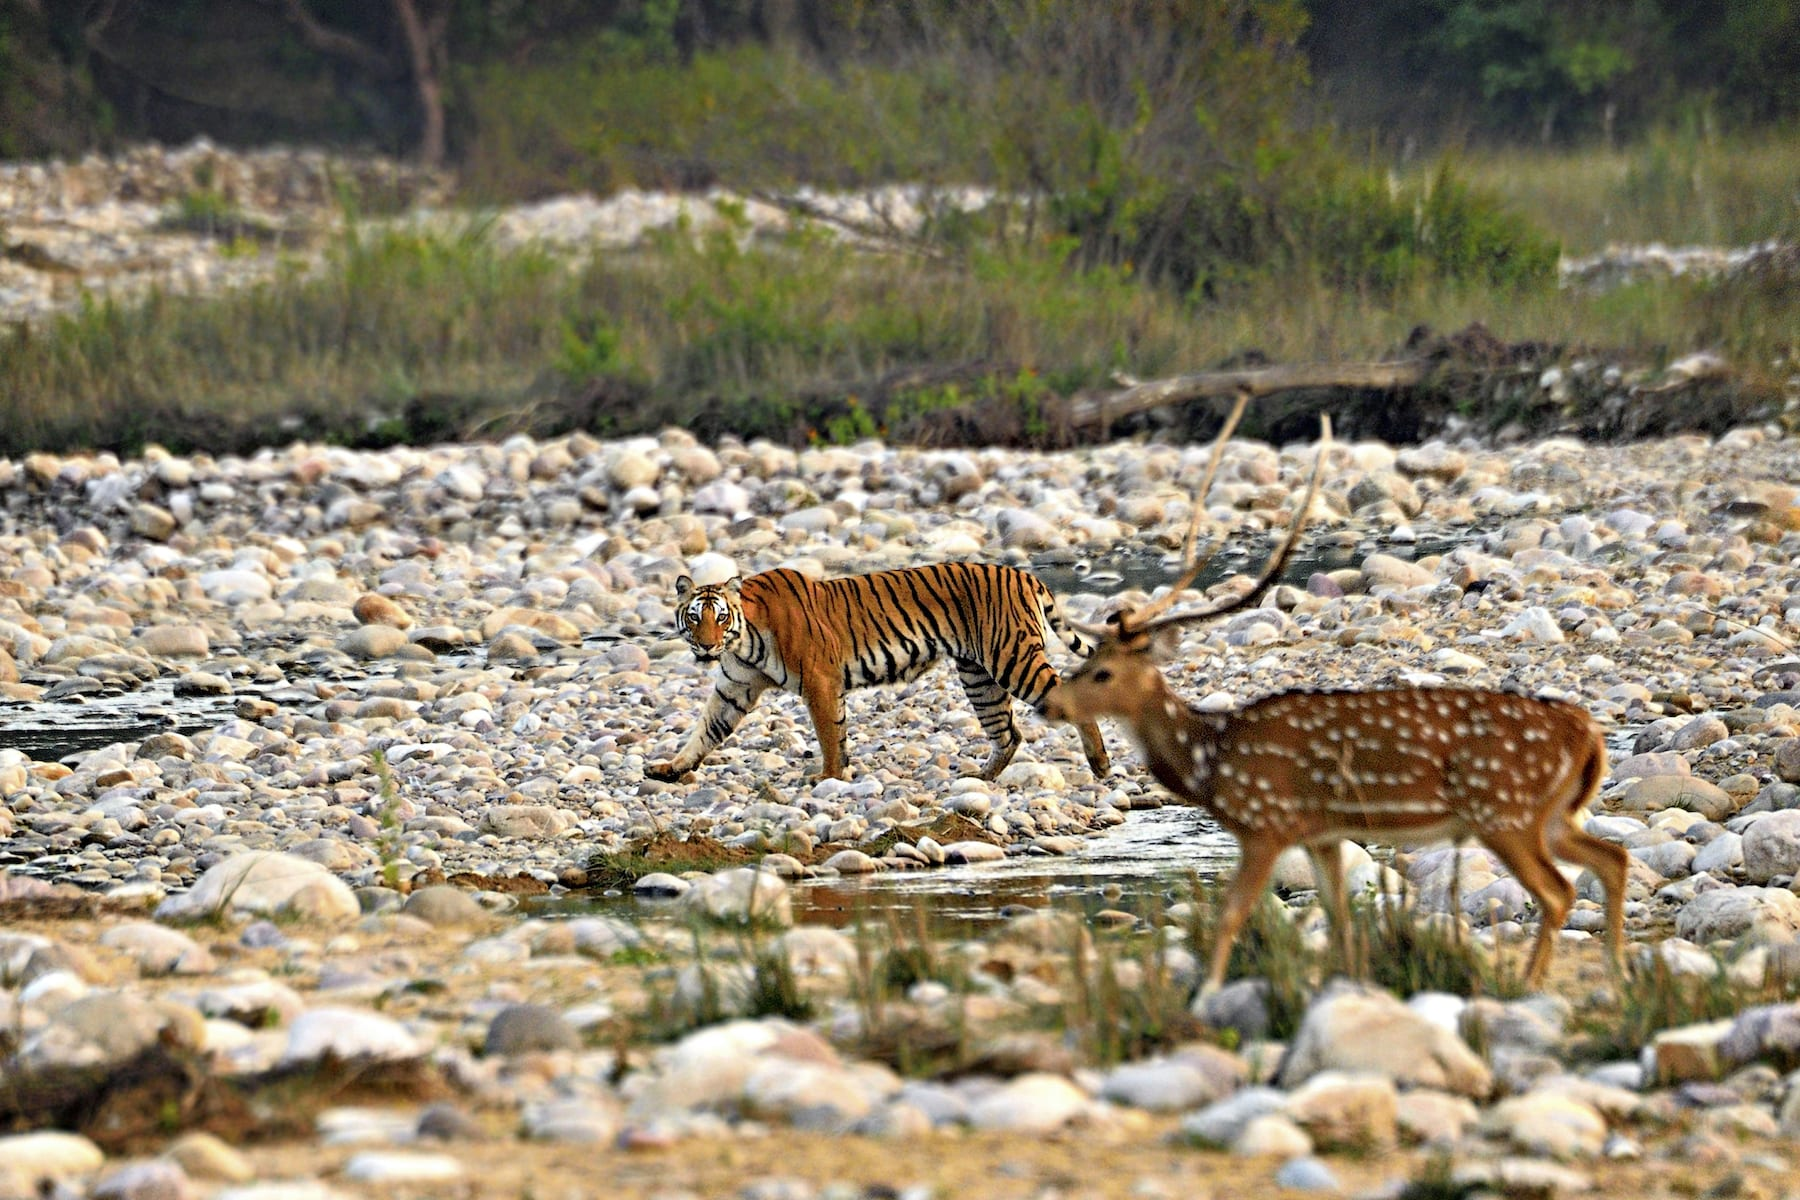 A tigress eyes a potential prey at Jim Corbett National Park. Photo: Rathika Ramasamy, 2019